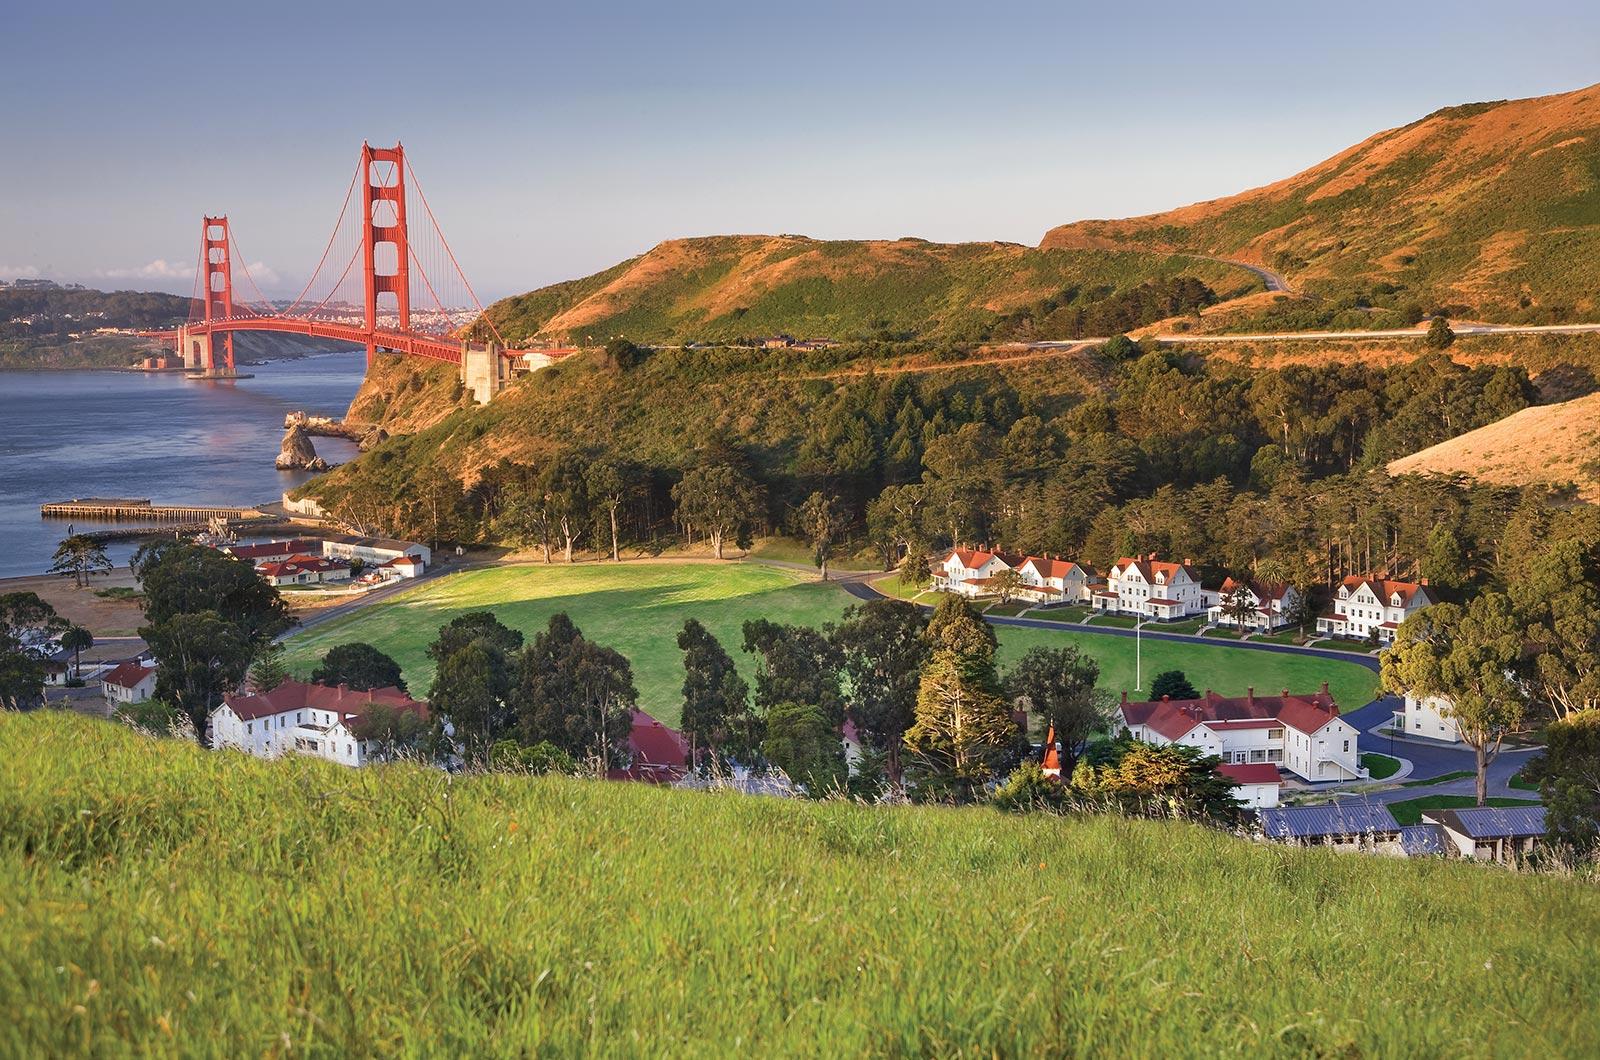 Cavallo Point, San Francisco